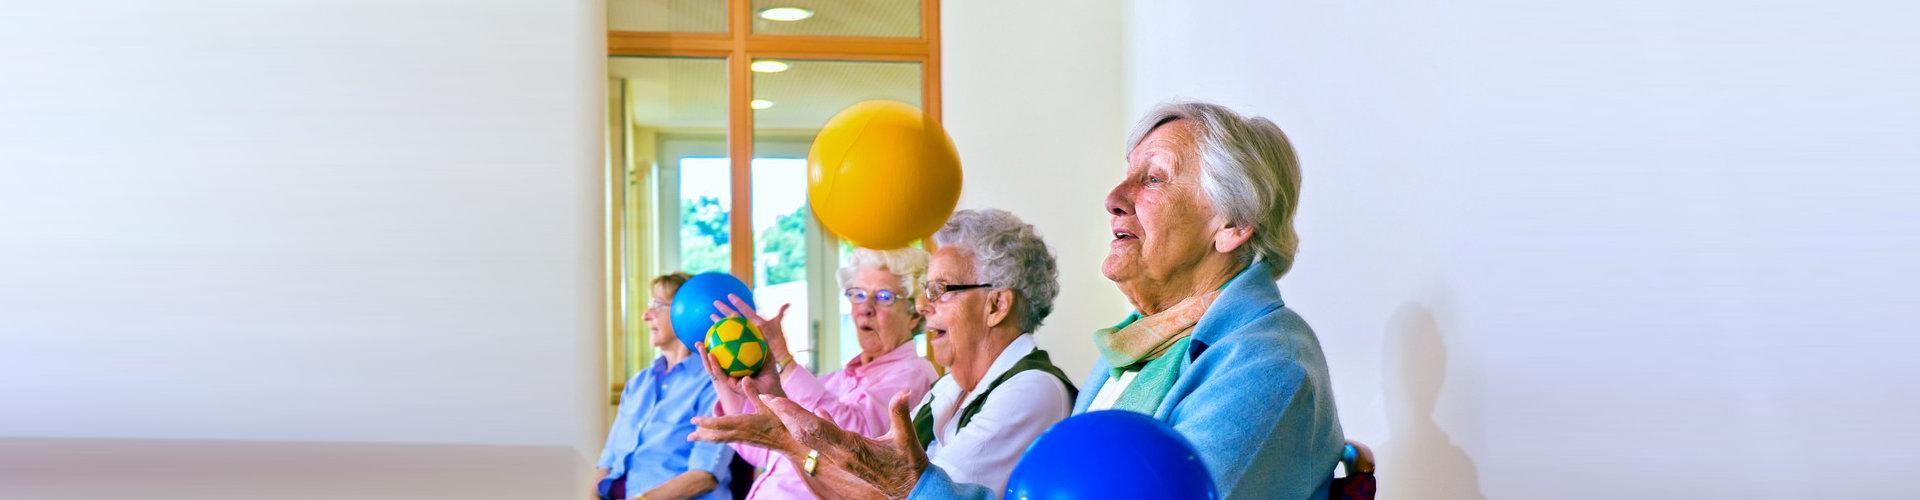 group of seniors playing